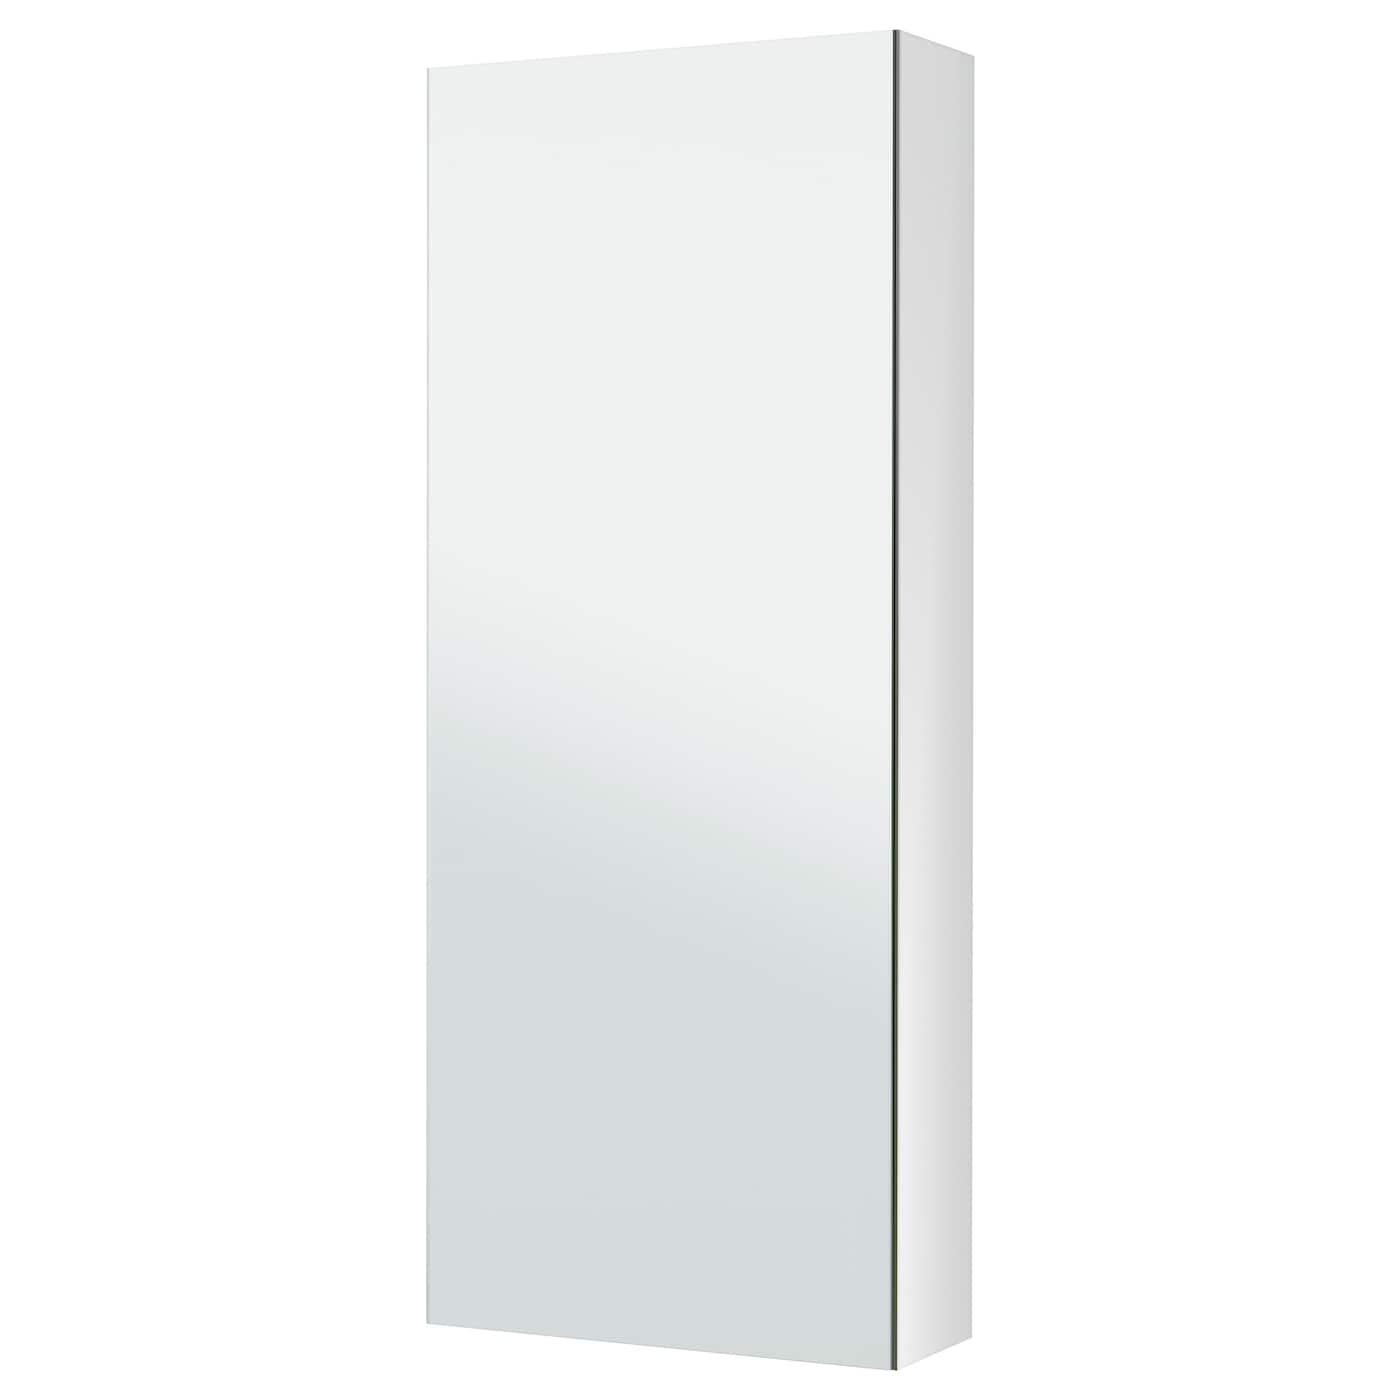 godmorgon spiegelkast met 1 deur 40 x 14 x 96 cm ikea. Black Bedroom Furniture Sets. Home Design Ideas